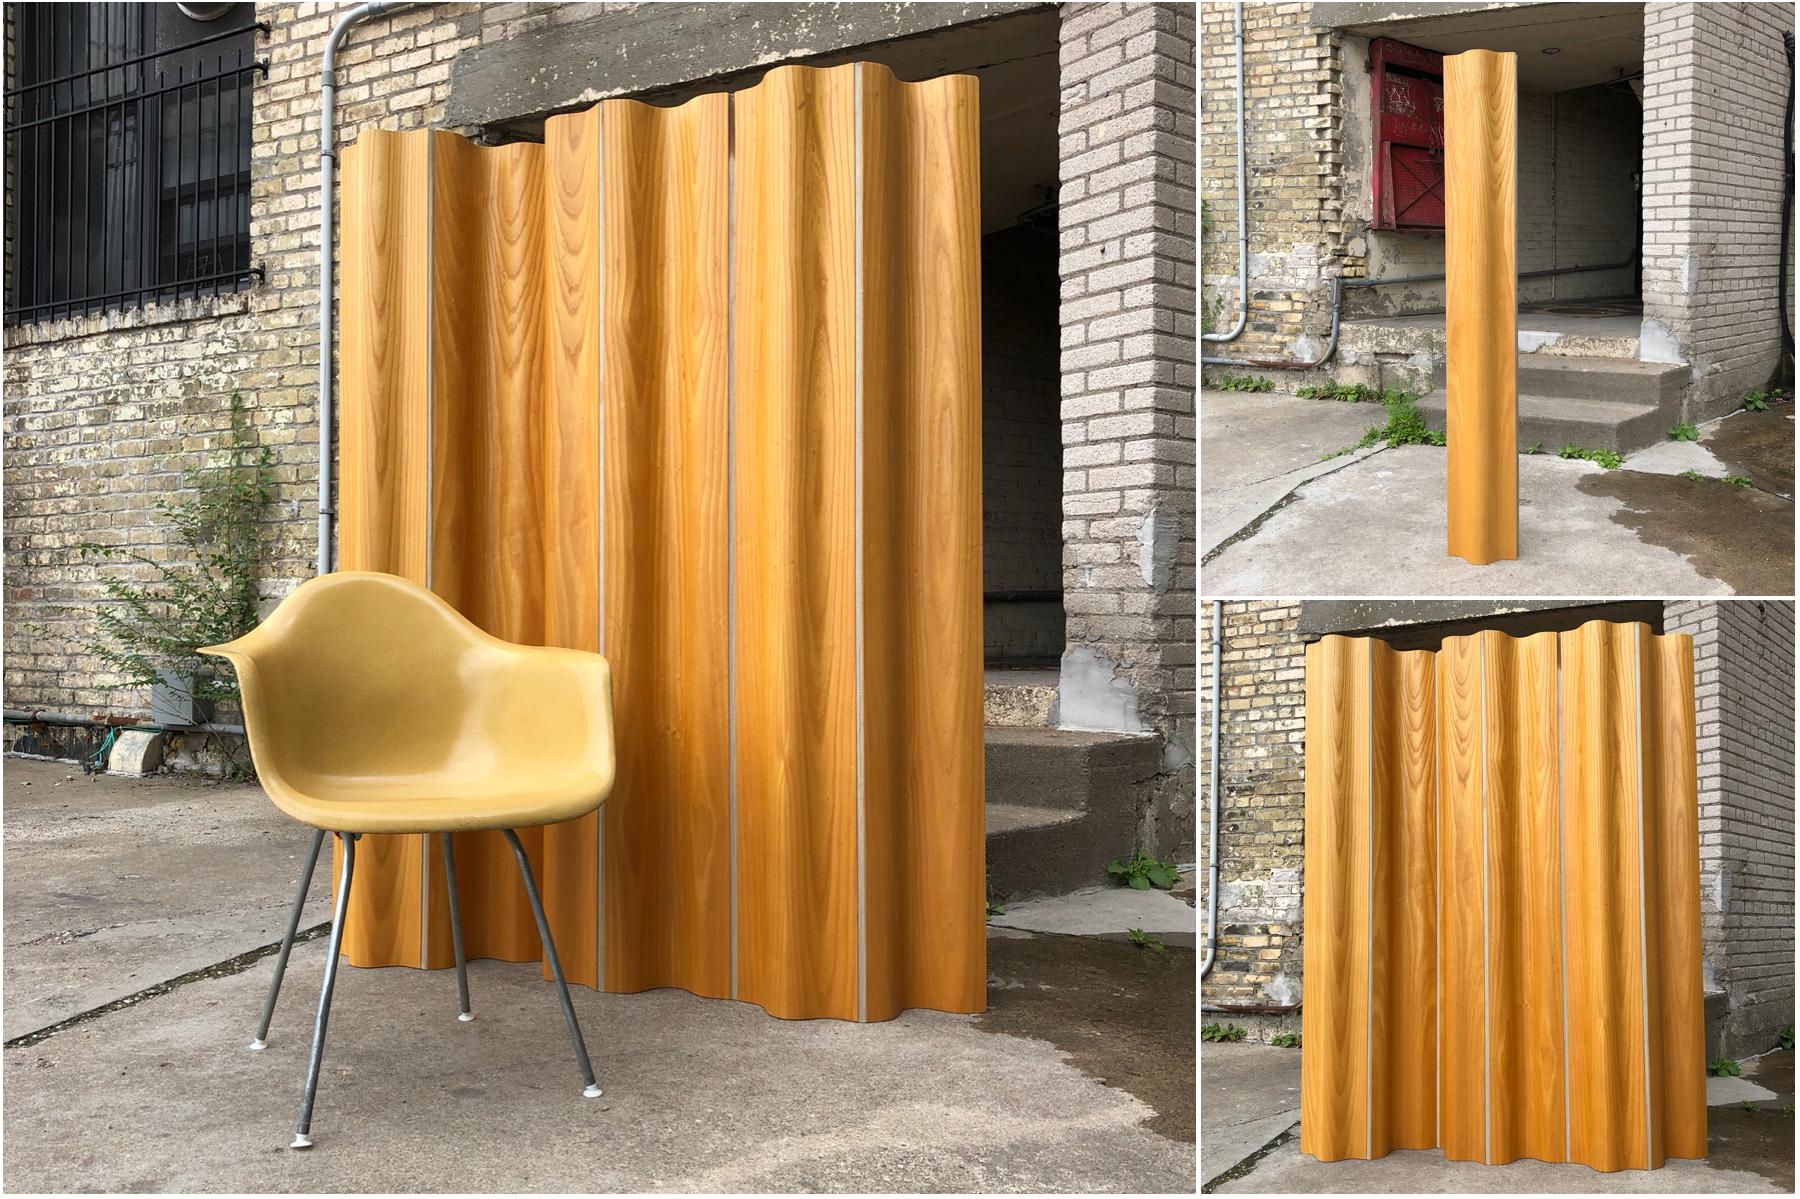 Eames - Herman Miller Folding Wood Screen (FWS)